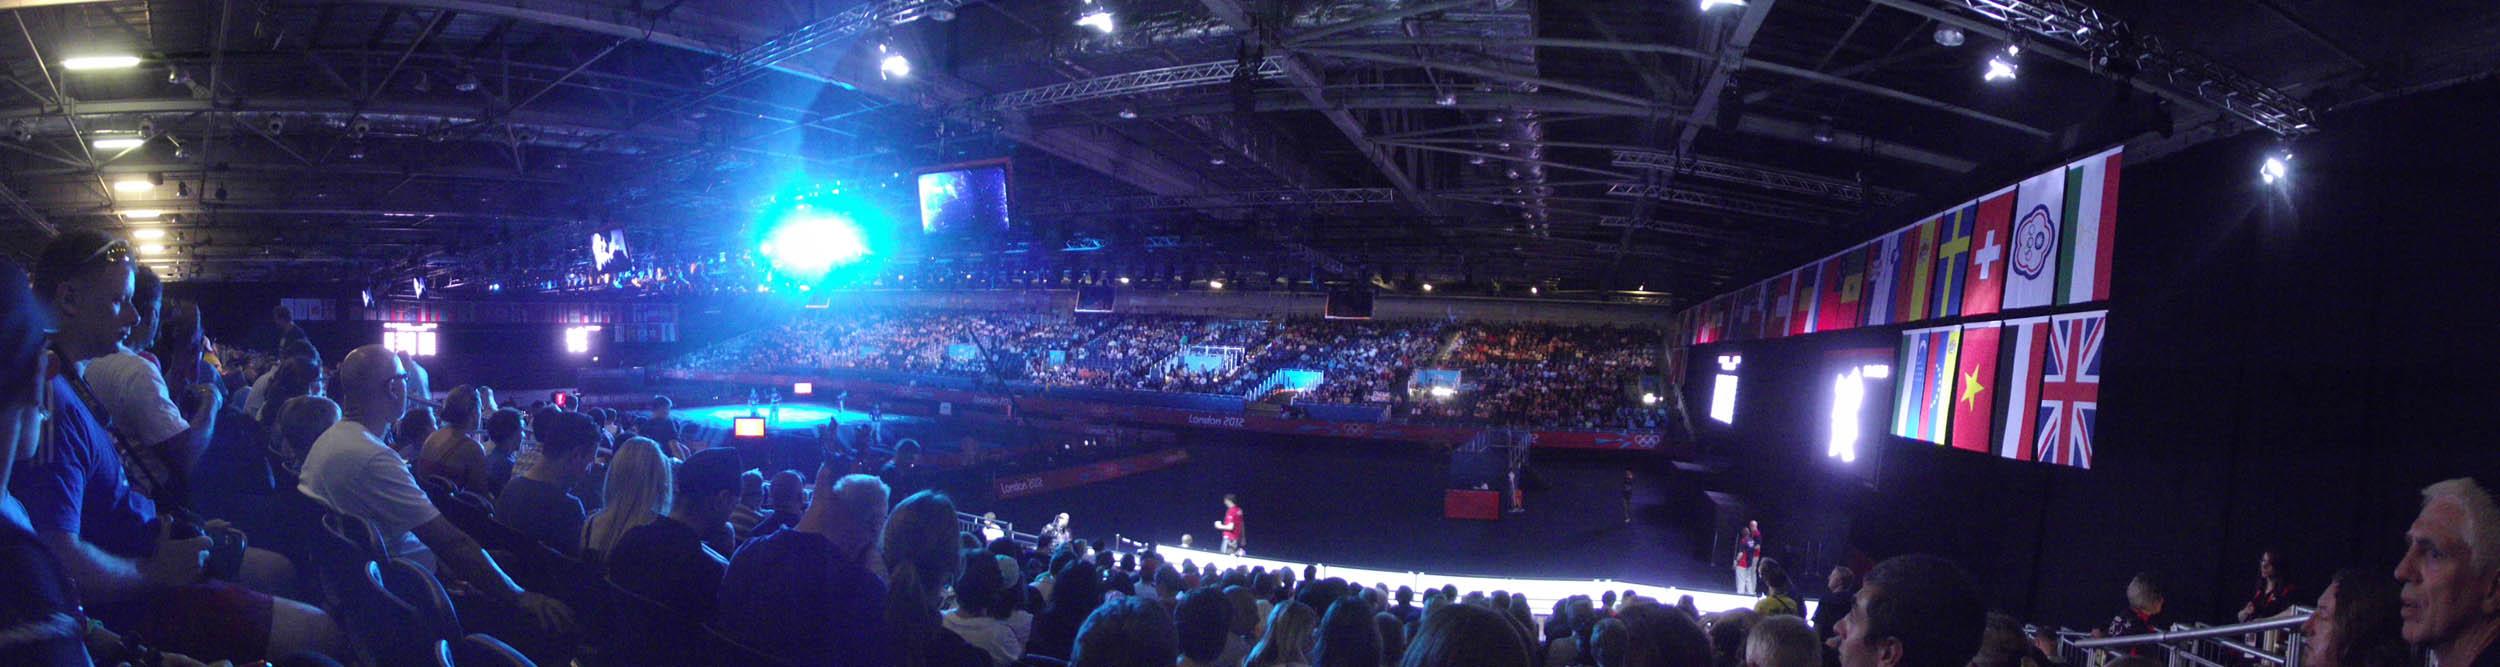 Panoramic view of indoor arena